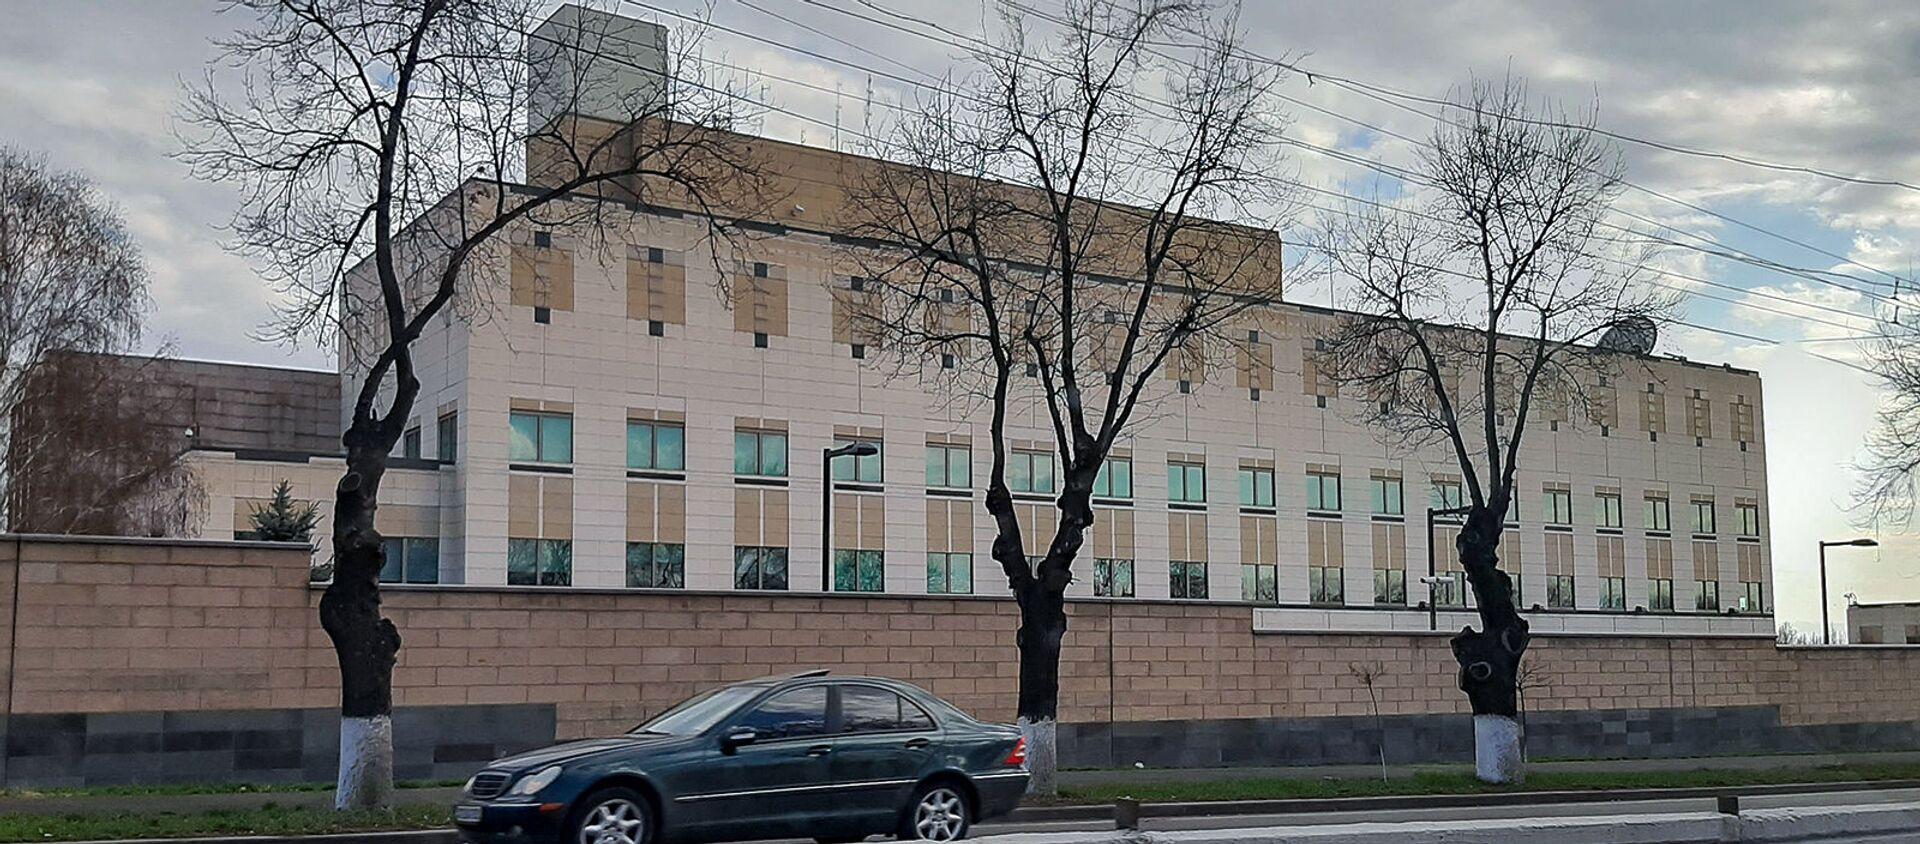 Здание посольства США в Армении - Sputnik Արմենիա, 1920, 20.07.2021